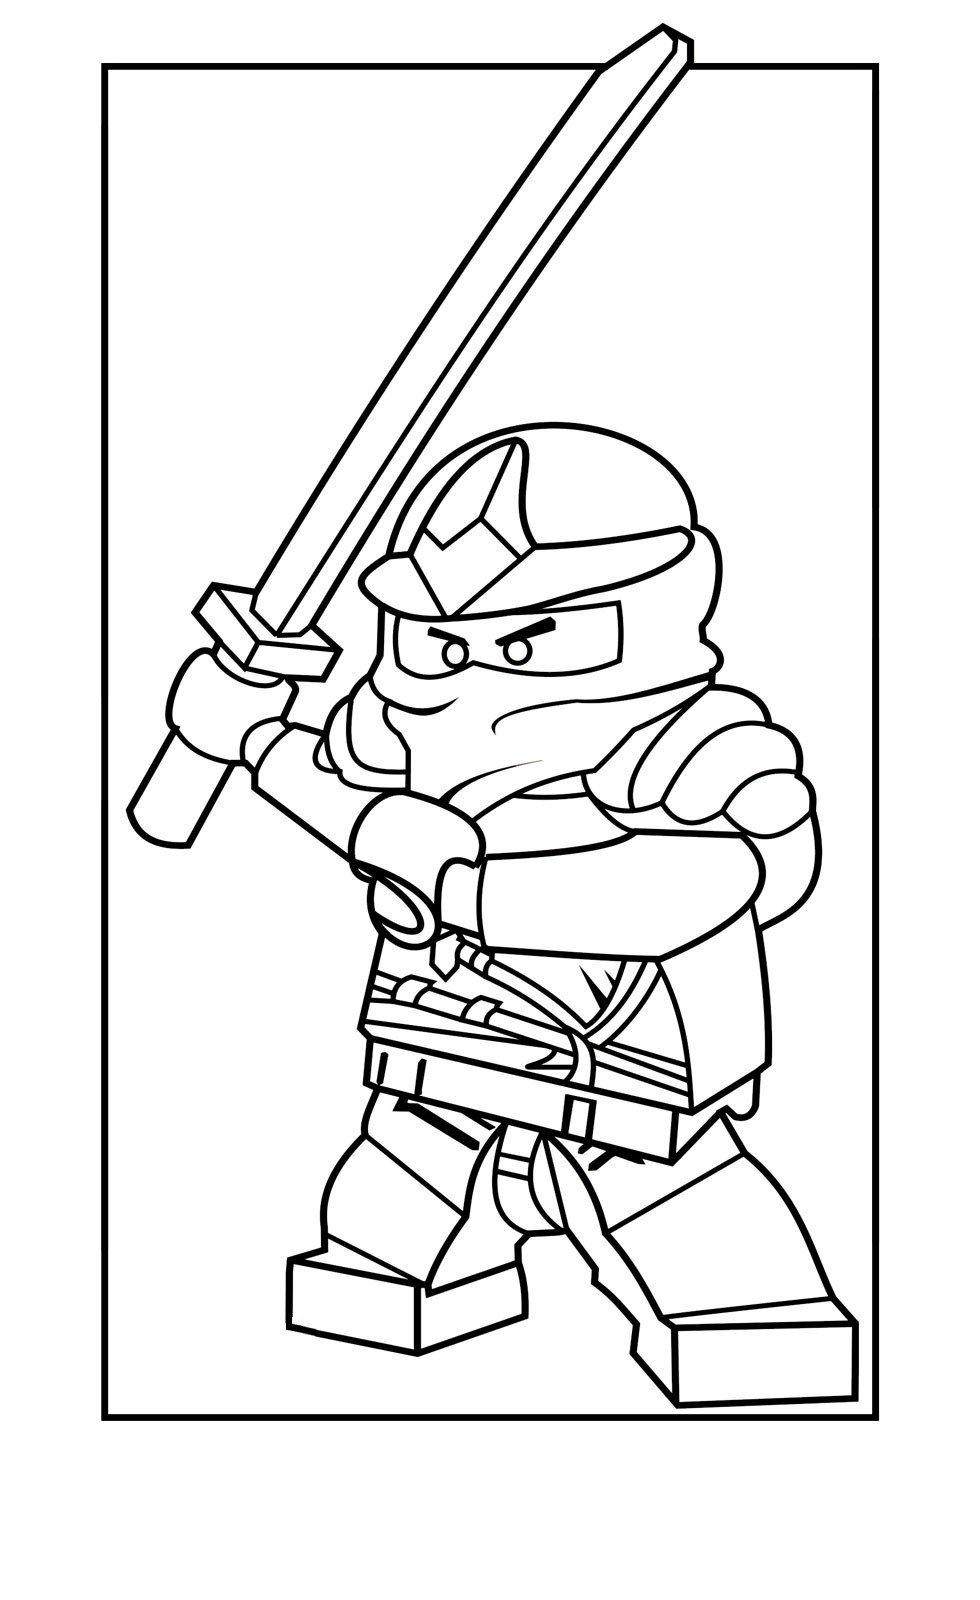 Картинка для раскраски «Ninjago Zane ZX»